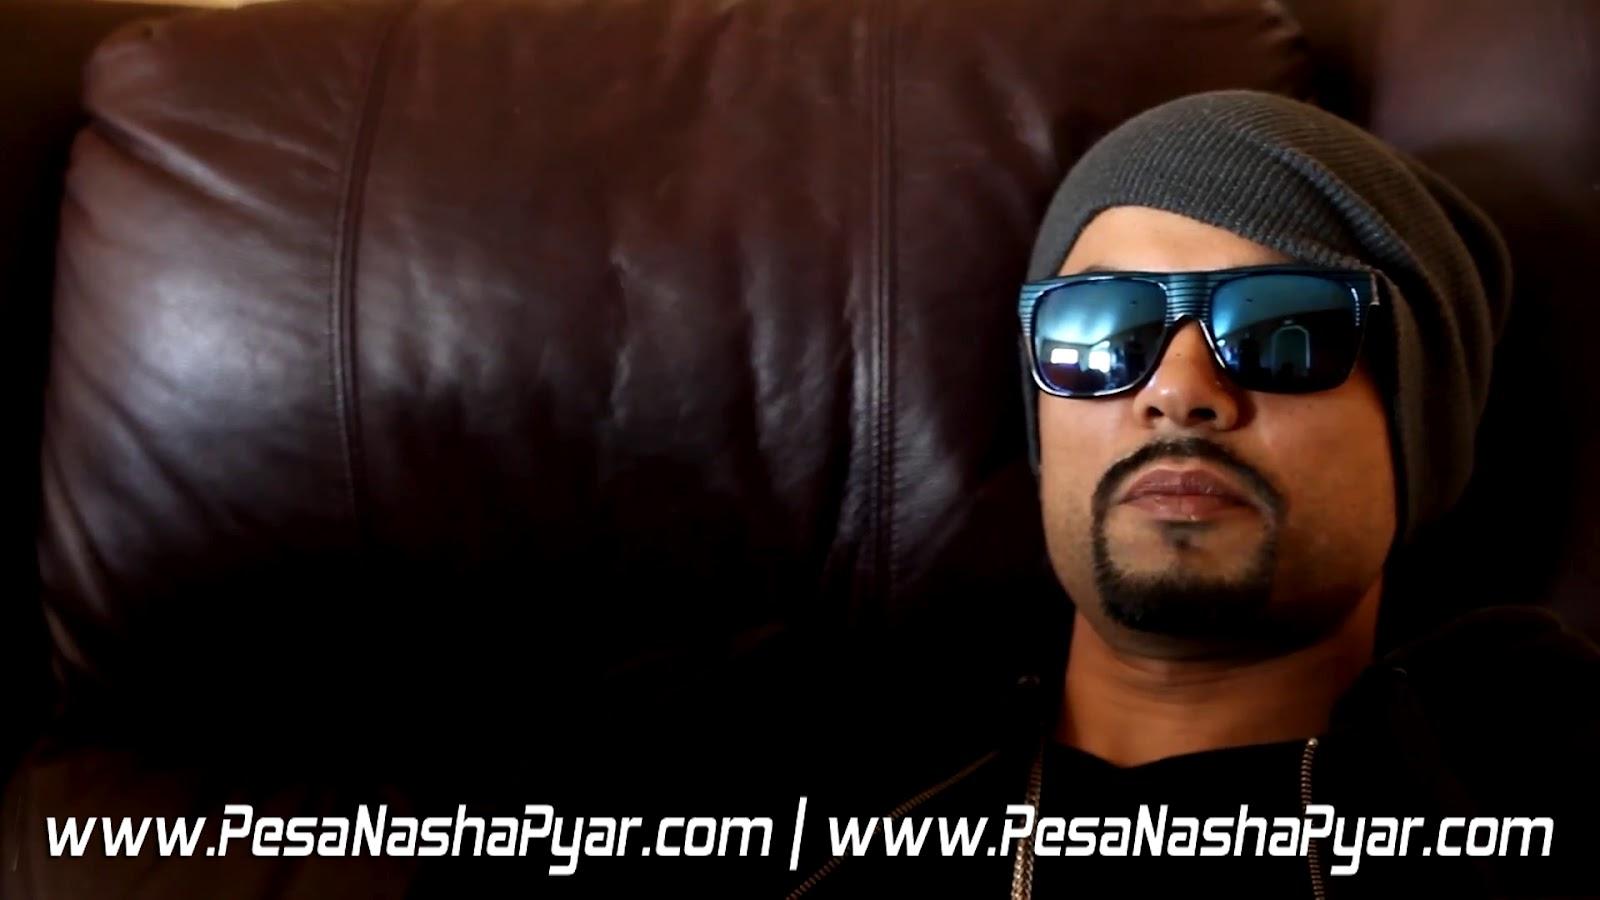 Download punjabi rap songs from songs.pk